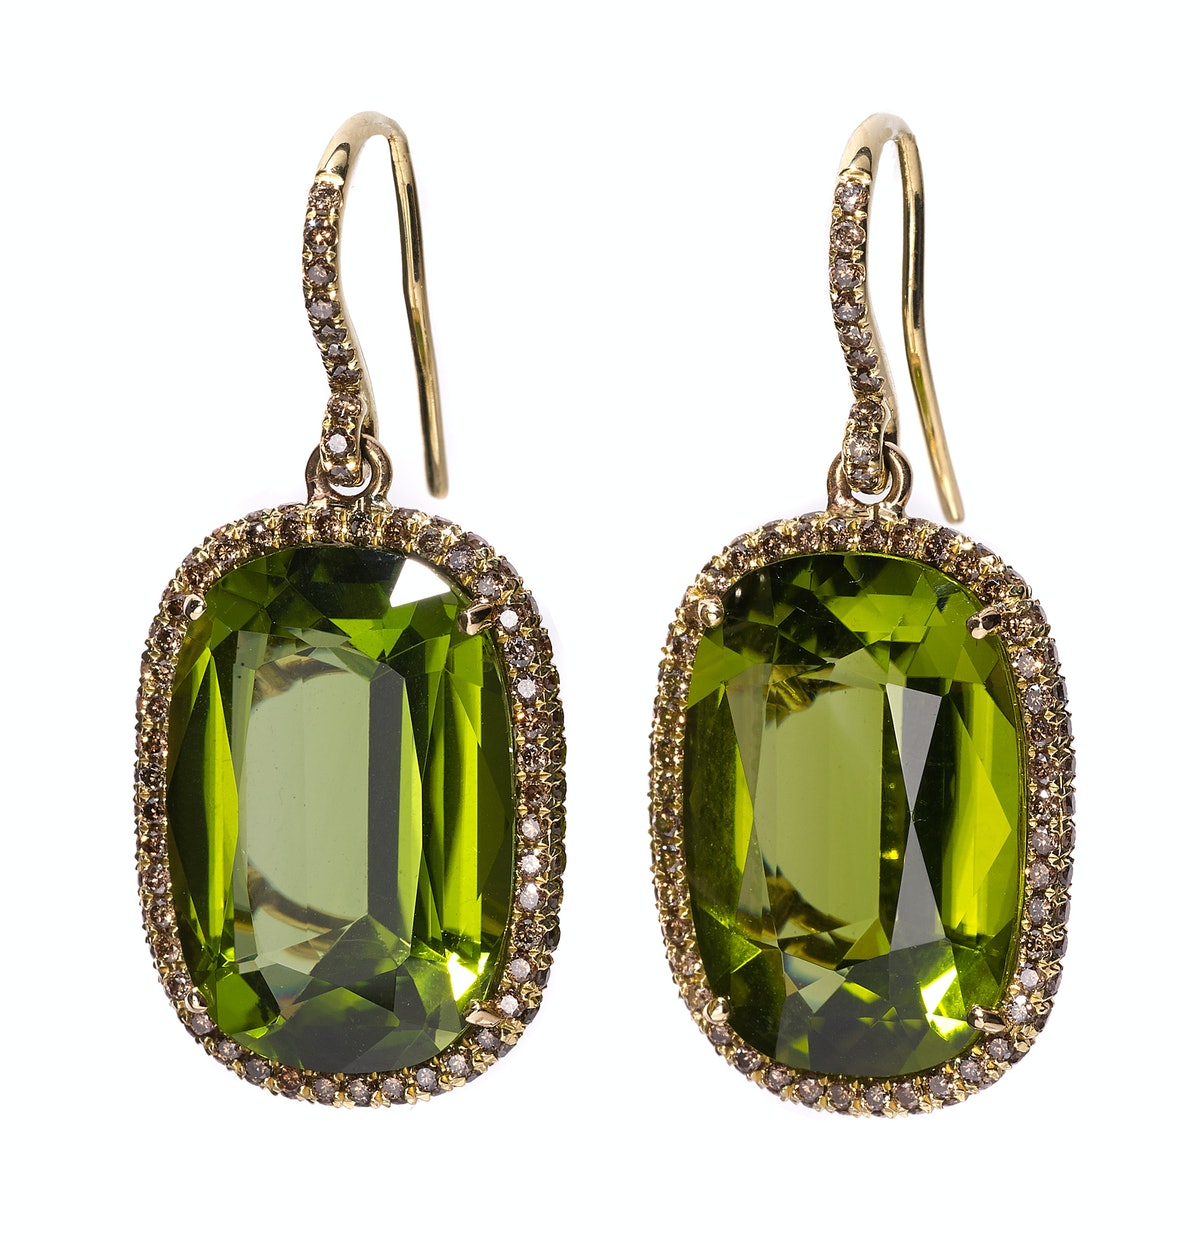 Mish gold, peridot, and diamond earrings